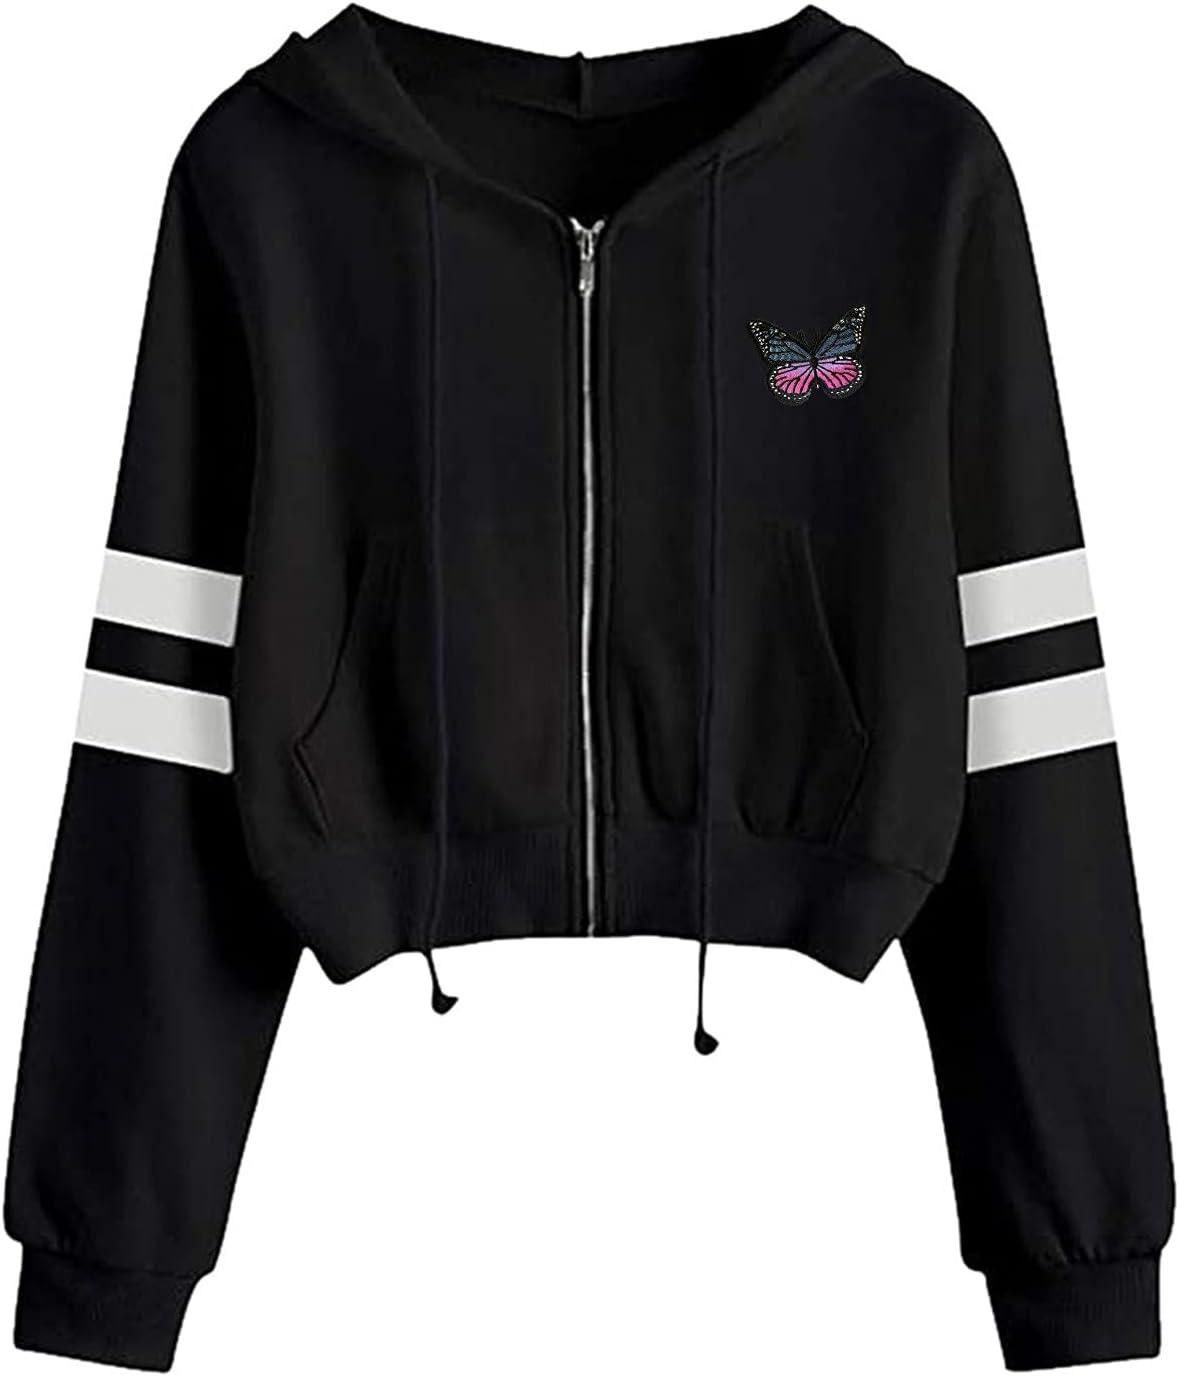 Eoailr Crop Sweatshirts Dealing full price Direct stock discount reduction Women Teen Crewneck Girls Sleeve Long Wo